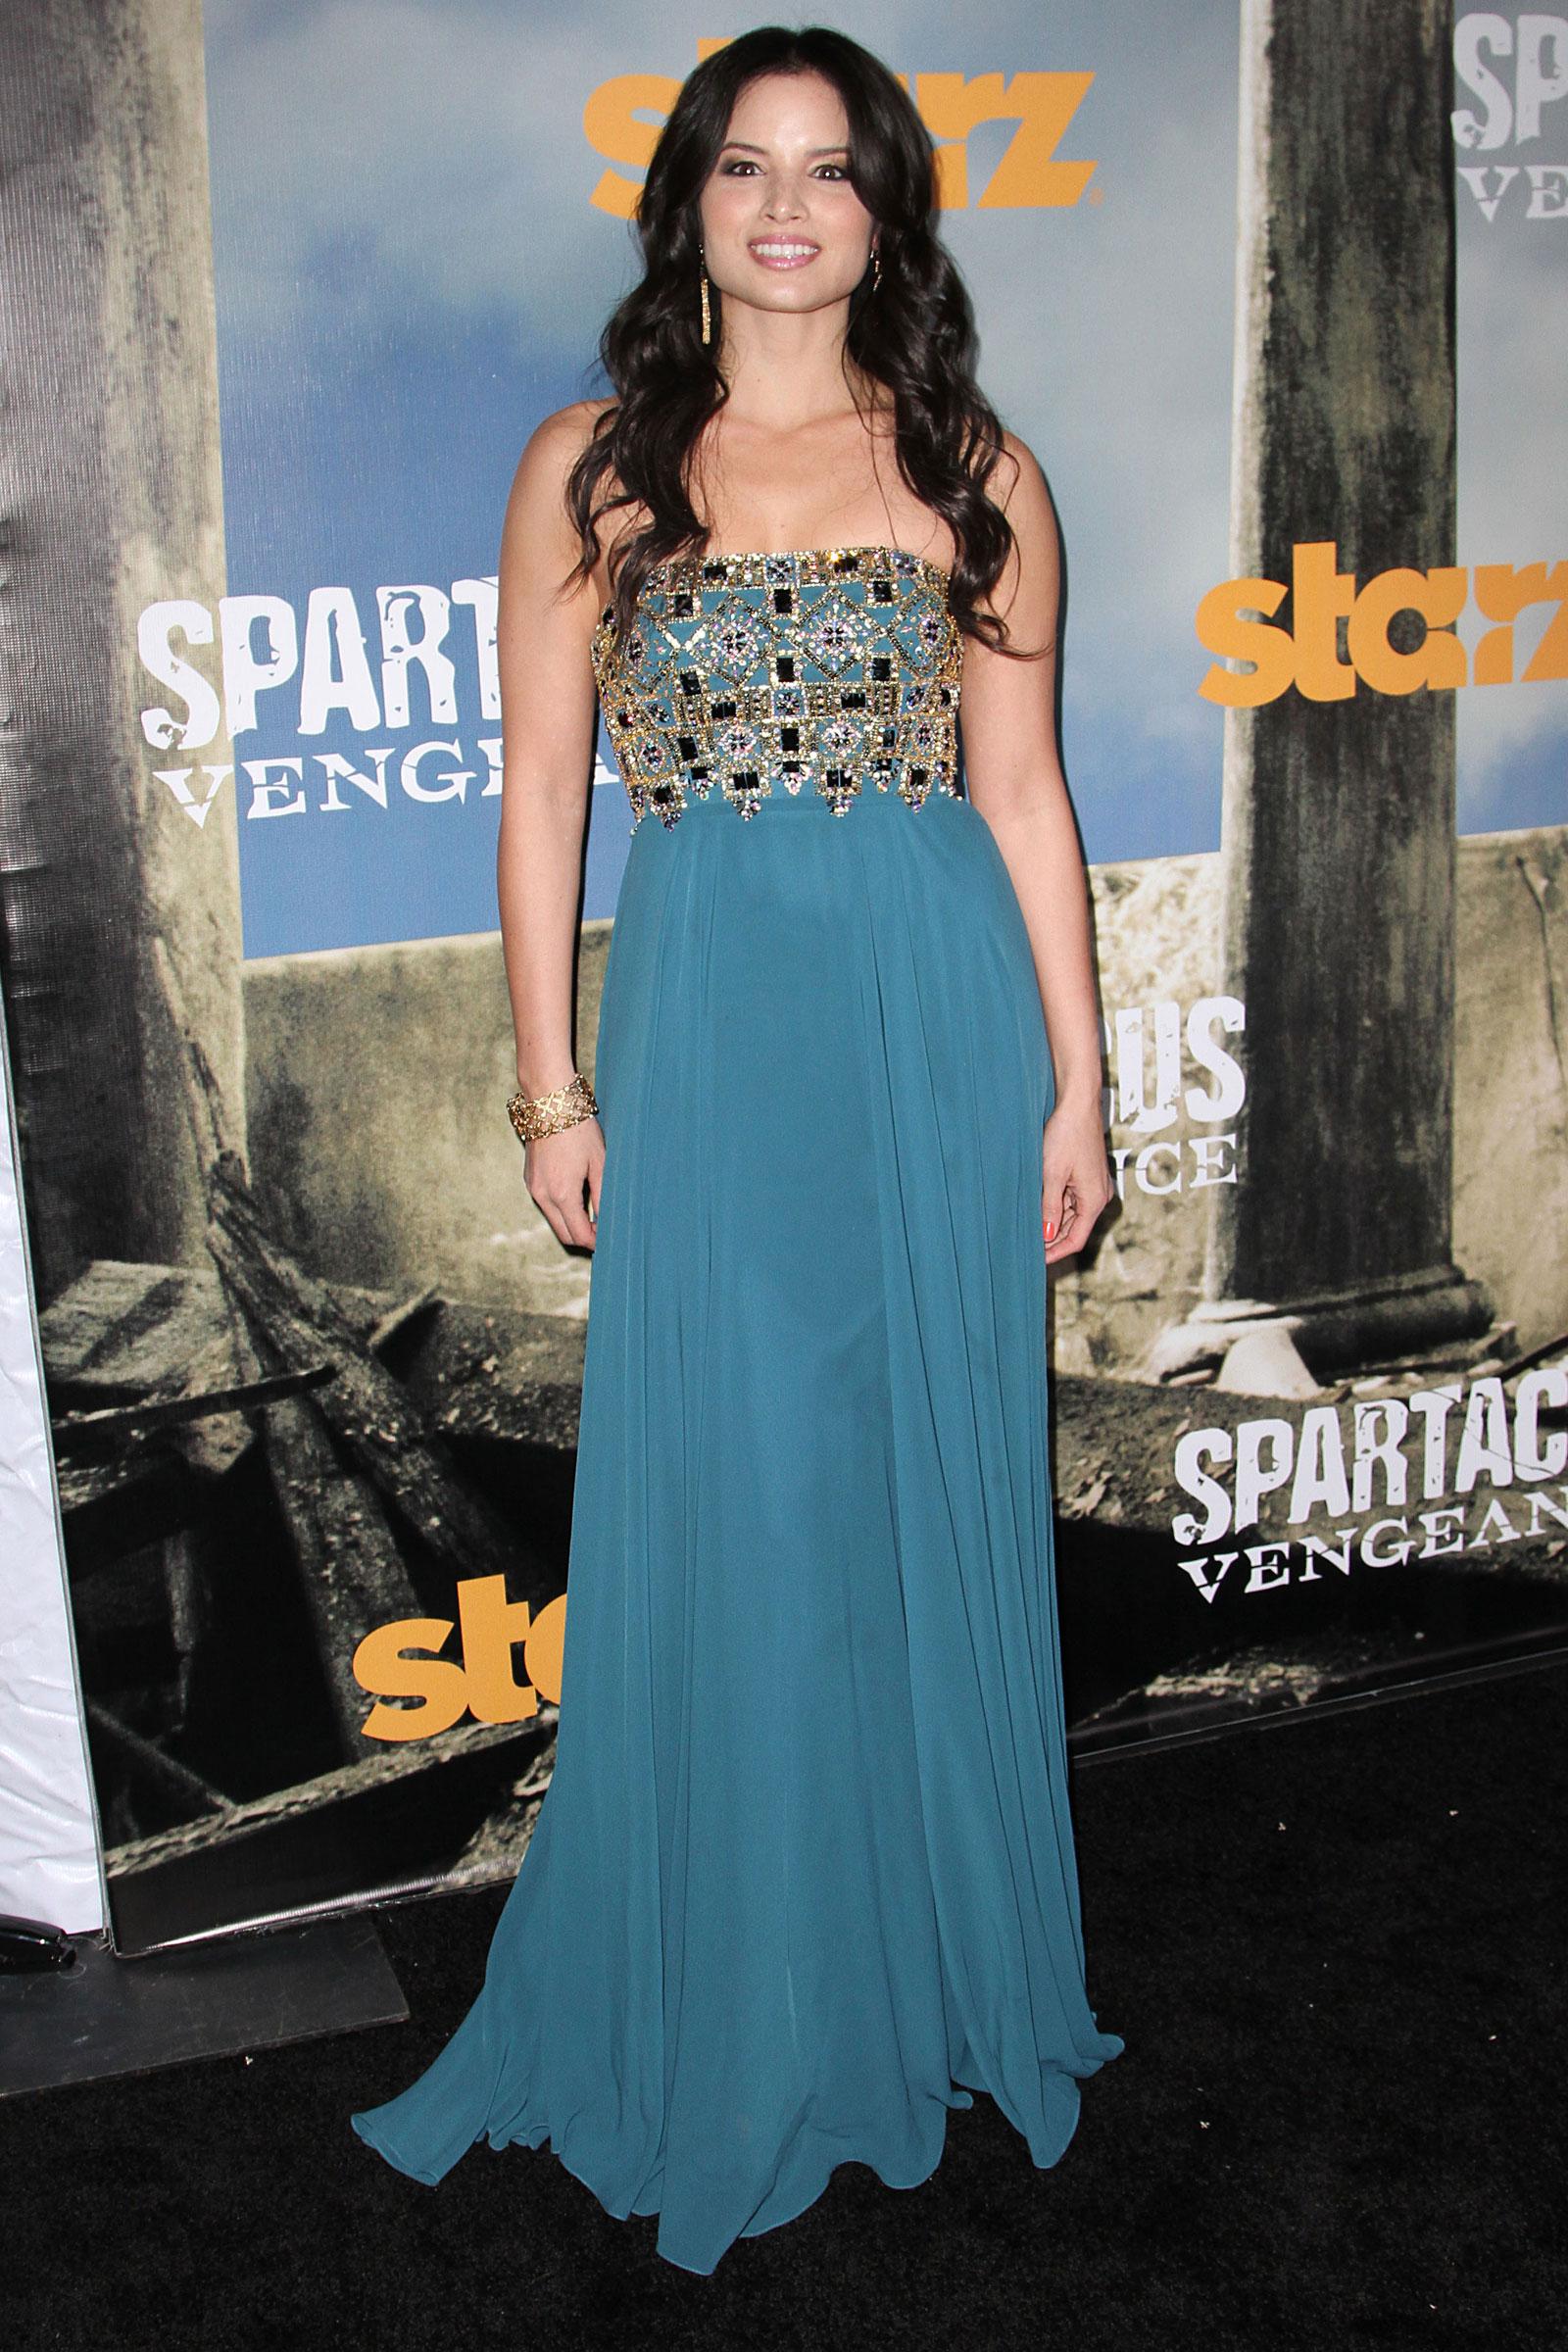 Katrina Law At STARZ Original Spartacus Vengance Premiere In Los Angeles HawtCelebs